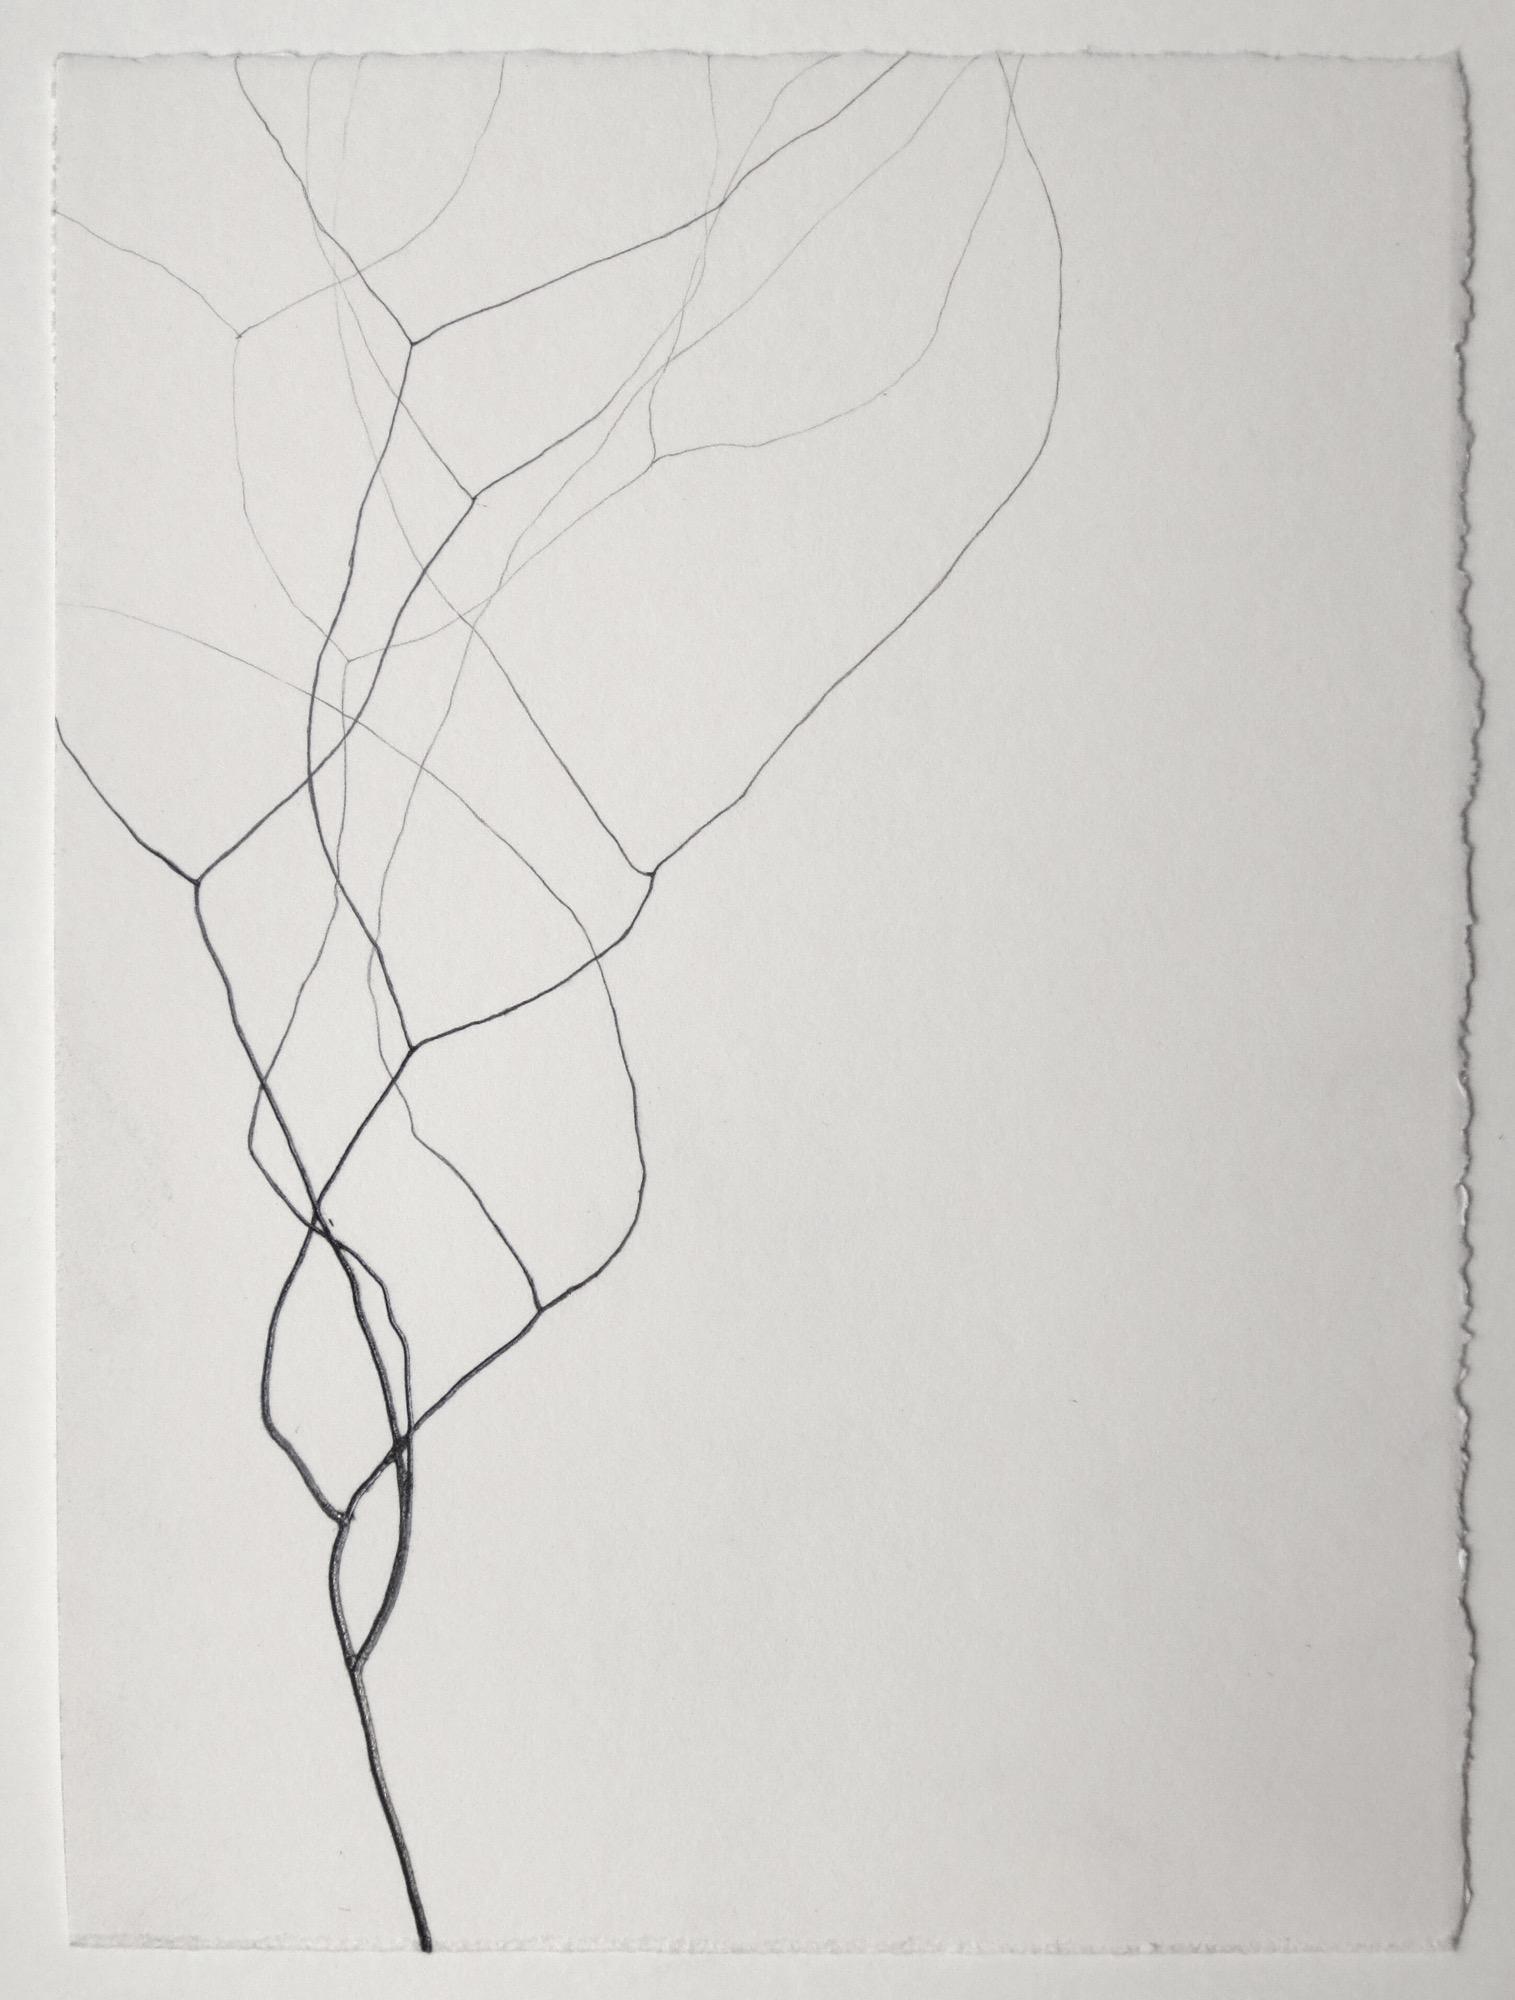 Christiane Löhr    Untitled , 2018 Graphite on paper 10 1/2 x 8 inches  27 x 20 cm